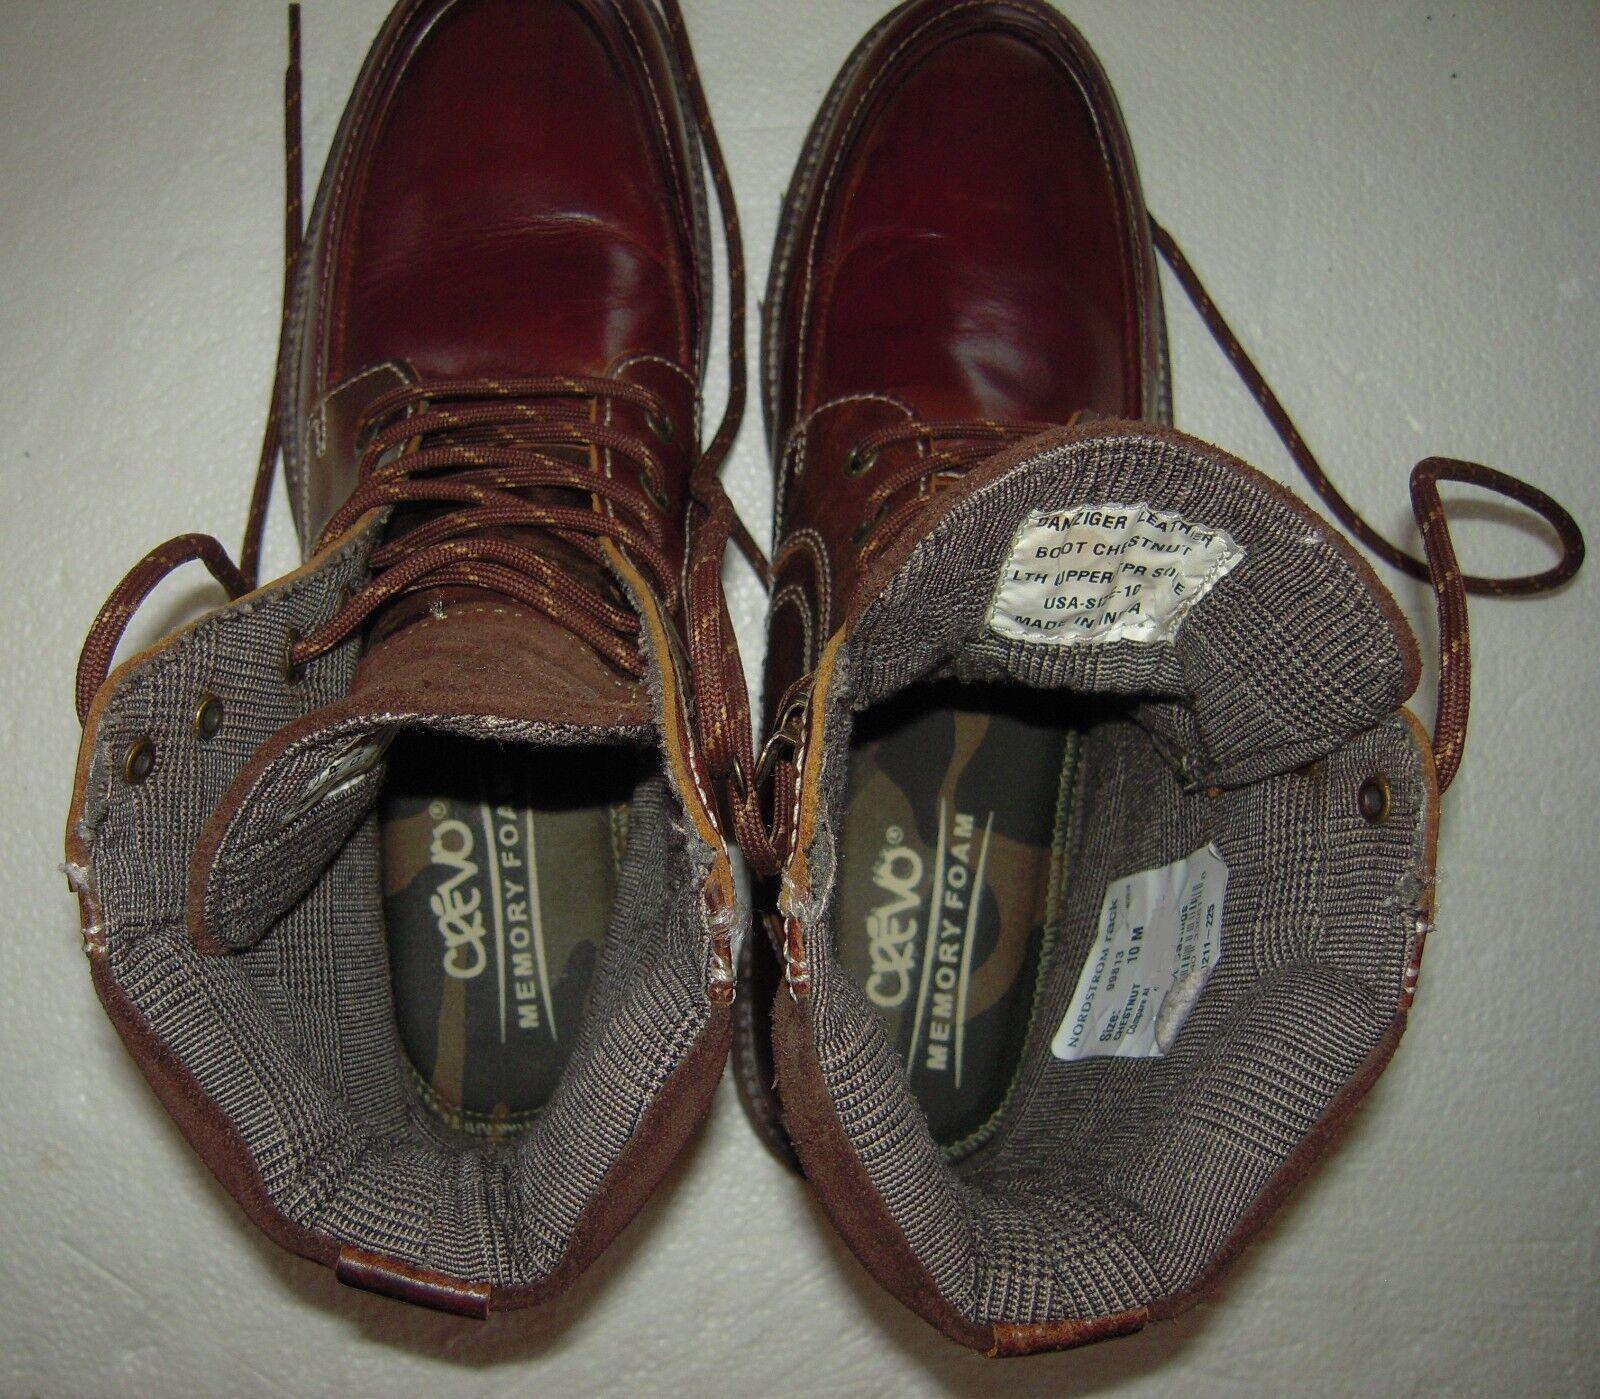 642609182ff CREVO Men s Danziger Fashion Boot Chestnut Leather 11 M US for sale online